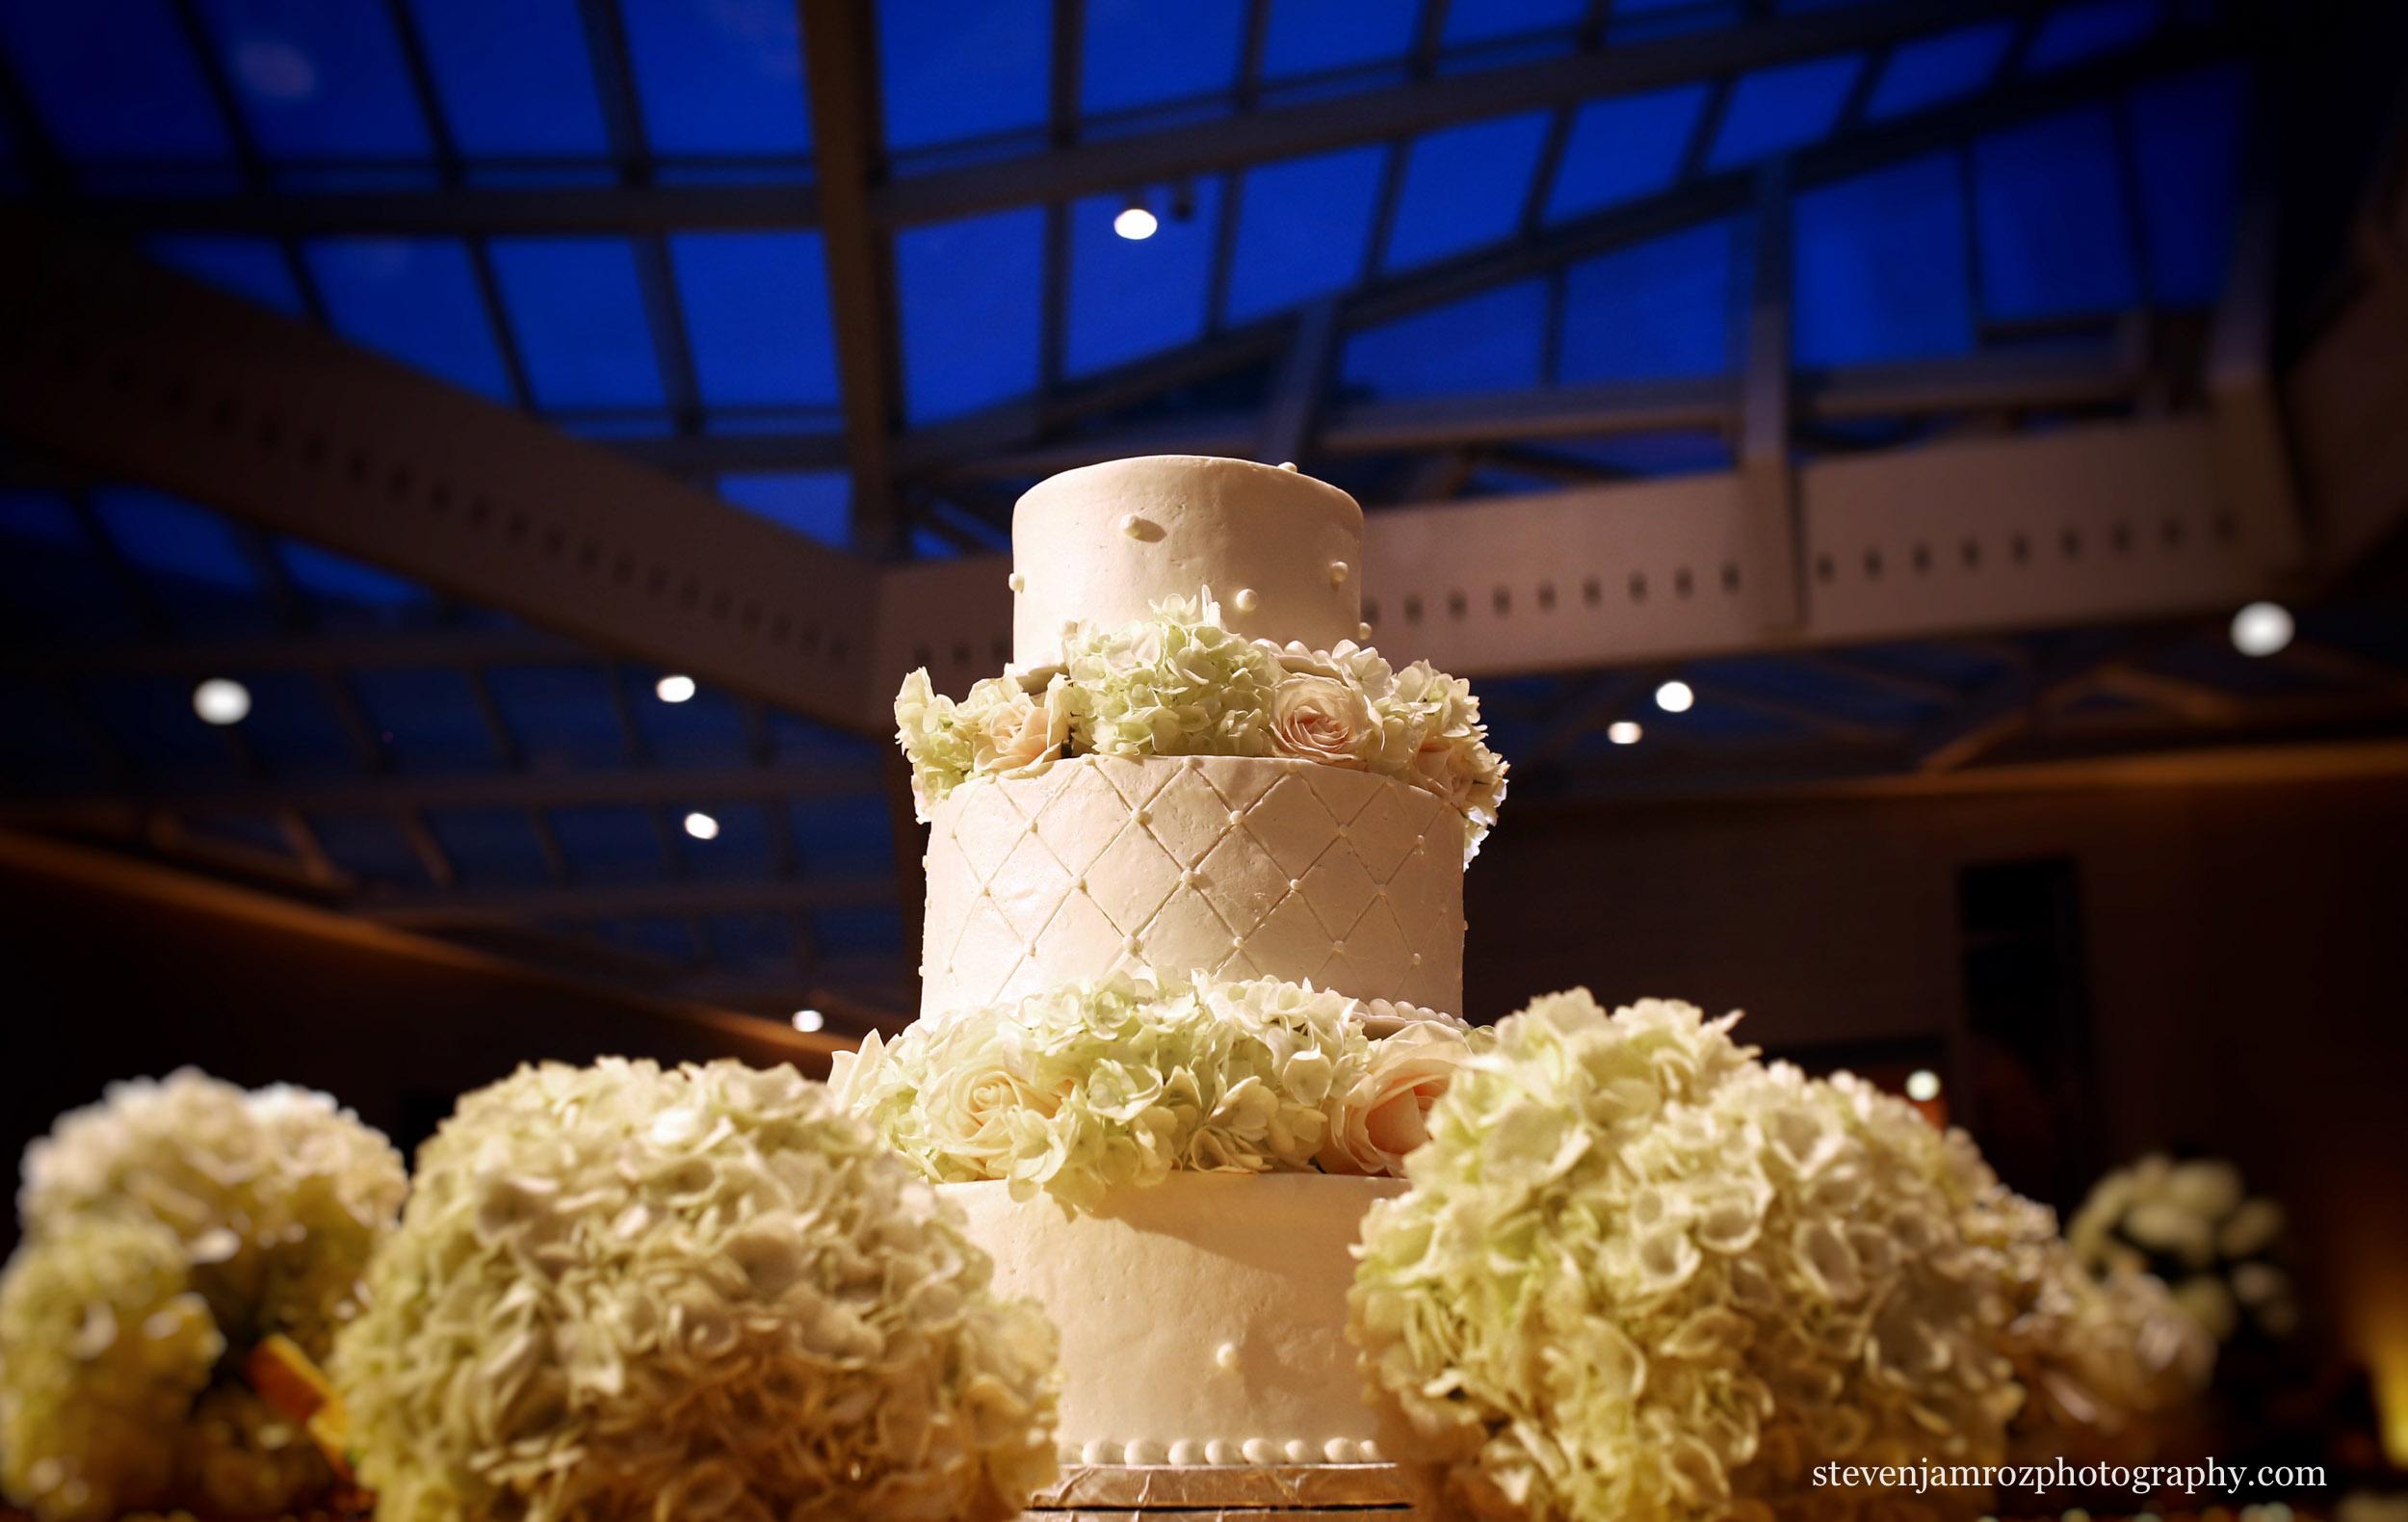 wedding-cake-nasher-museum-of-art-wedding.jpg